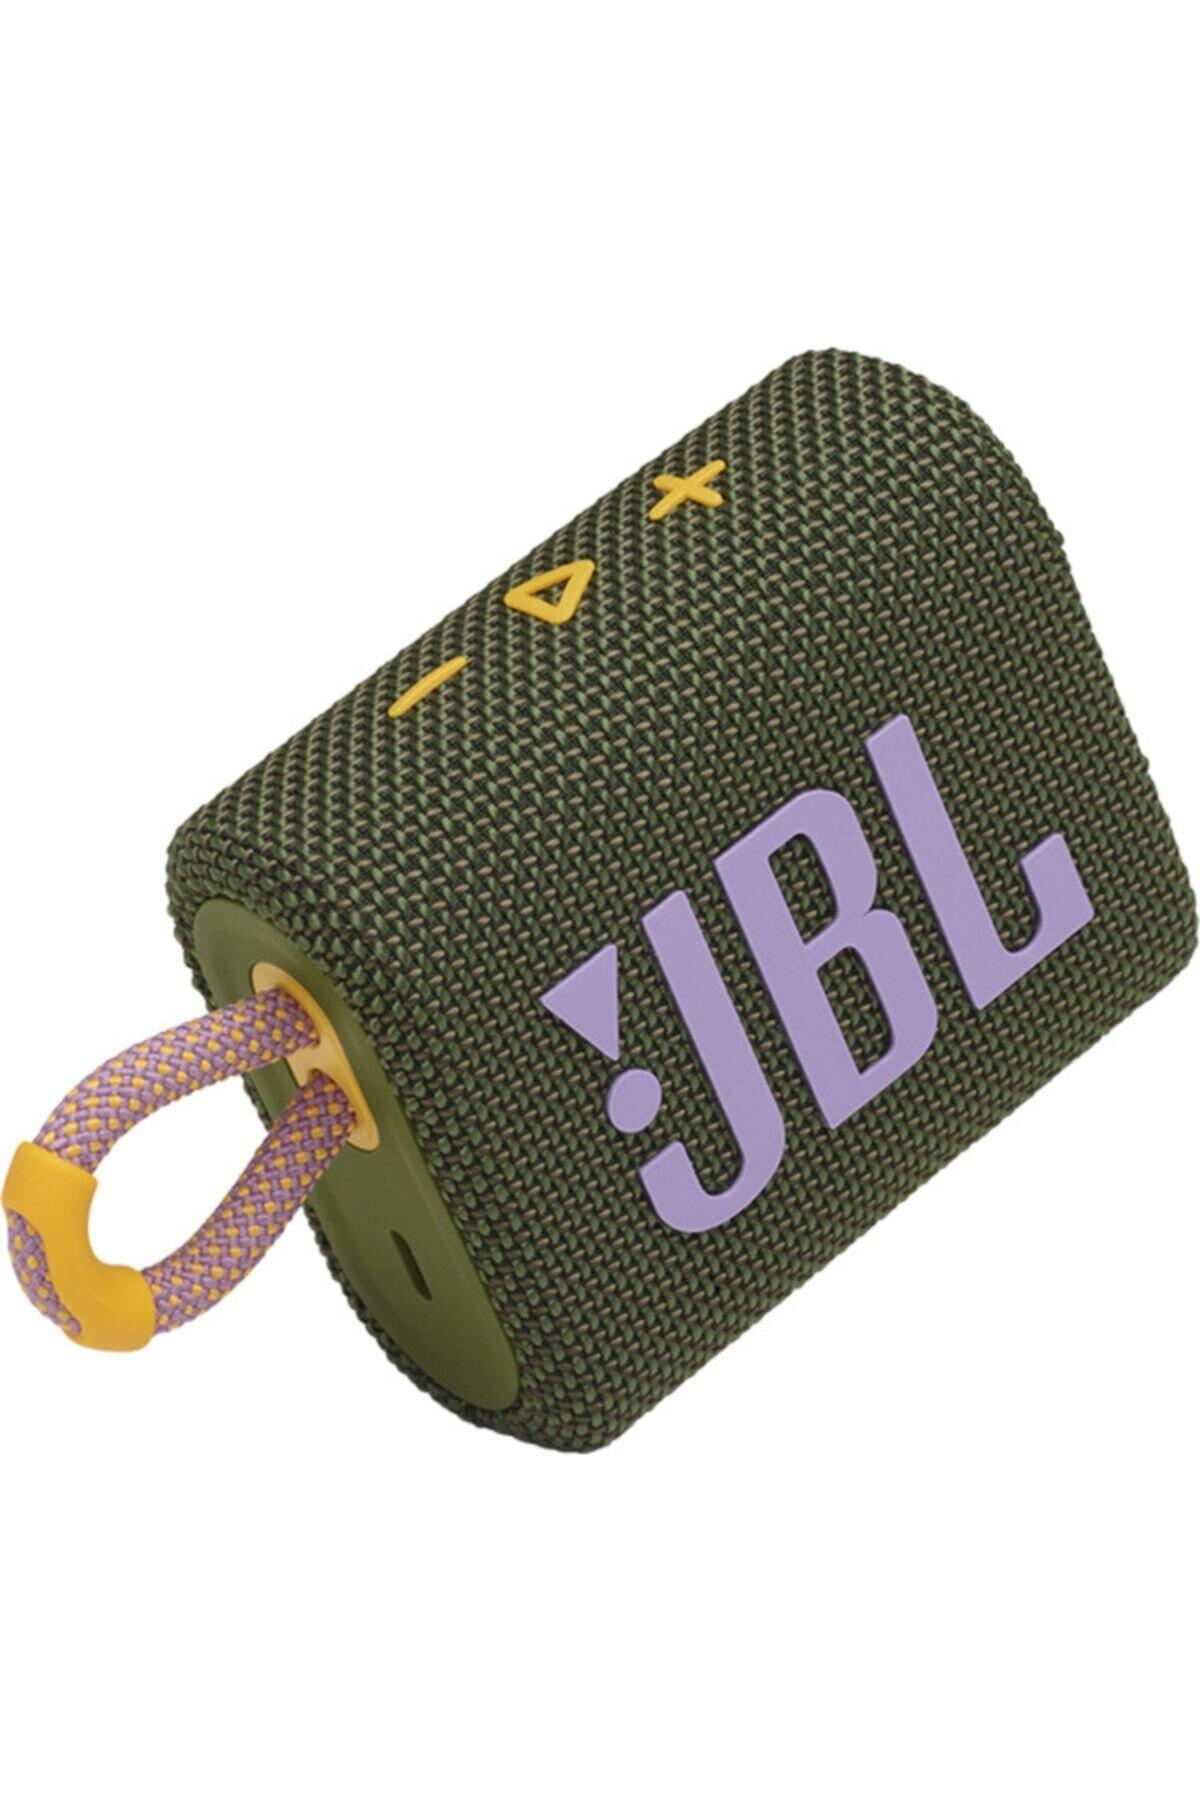 JBL Yeşil Go 3 Taşınabilir Bluetooth Hoparlör 1